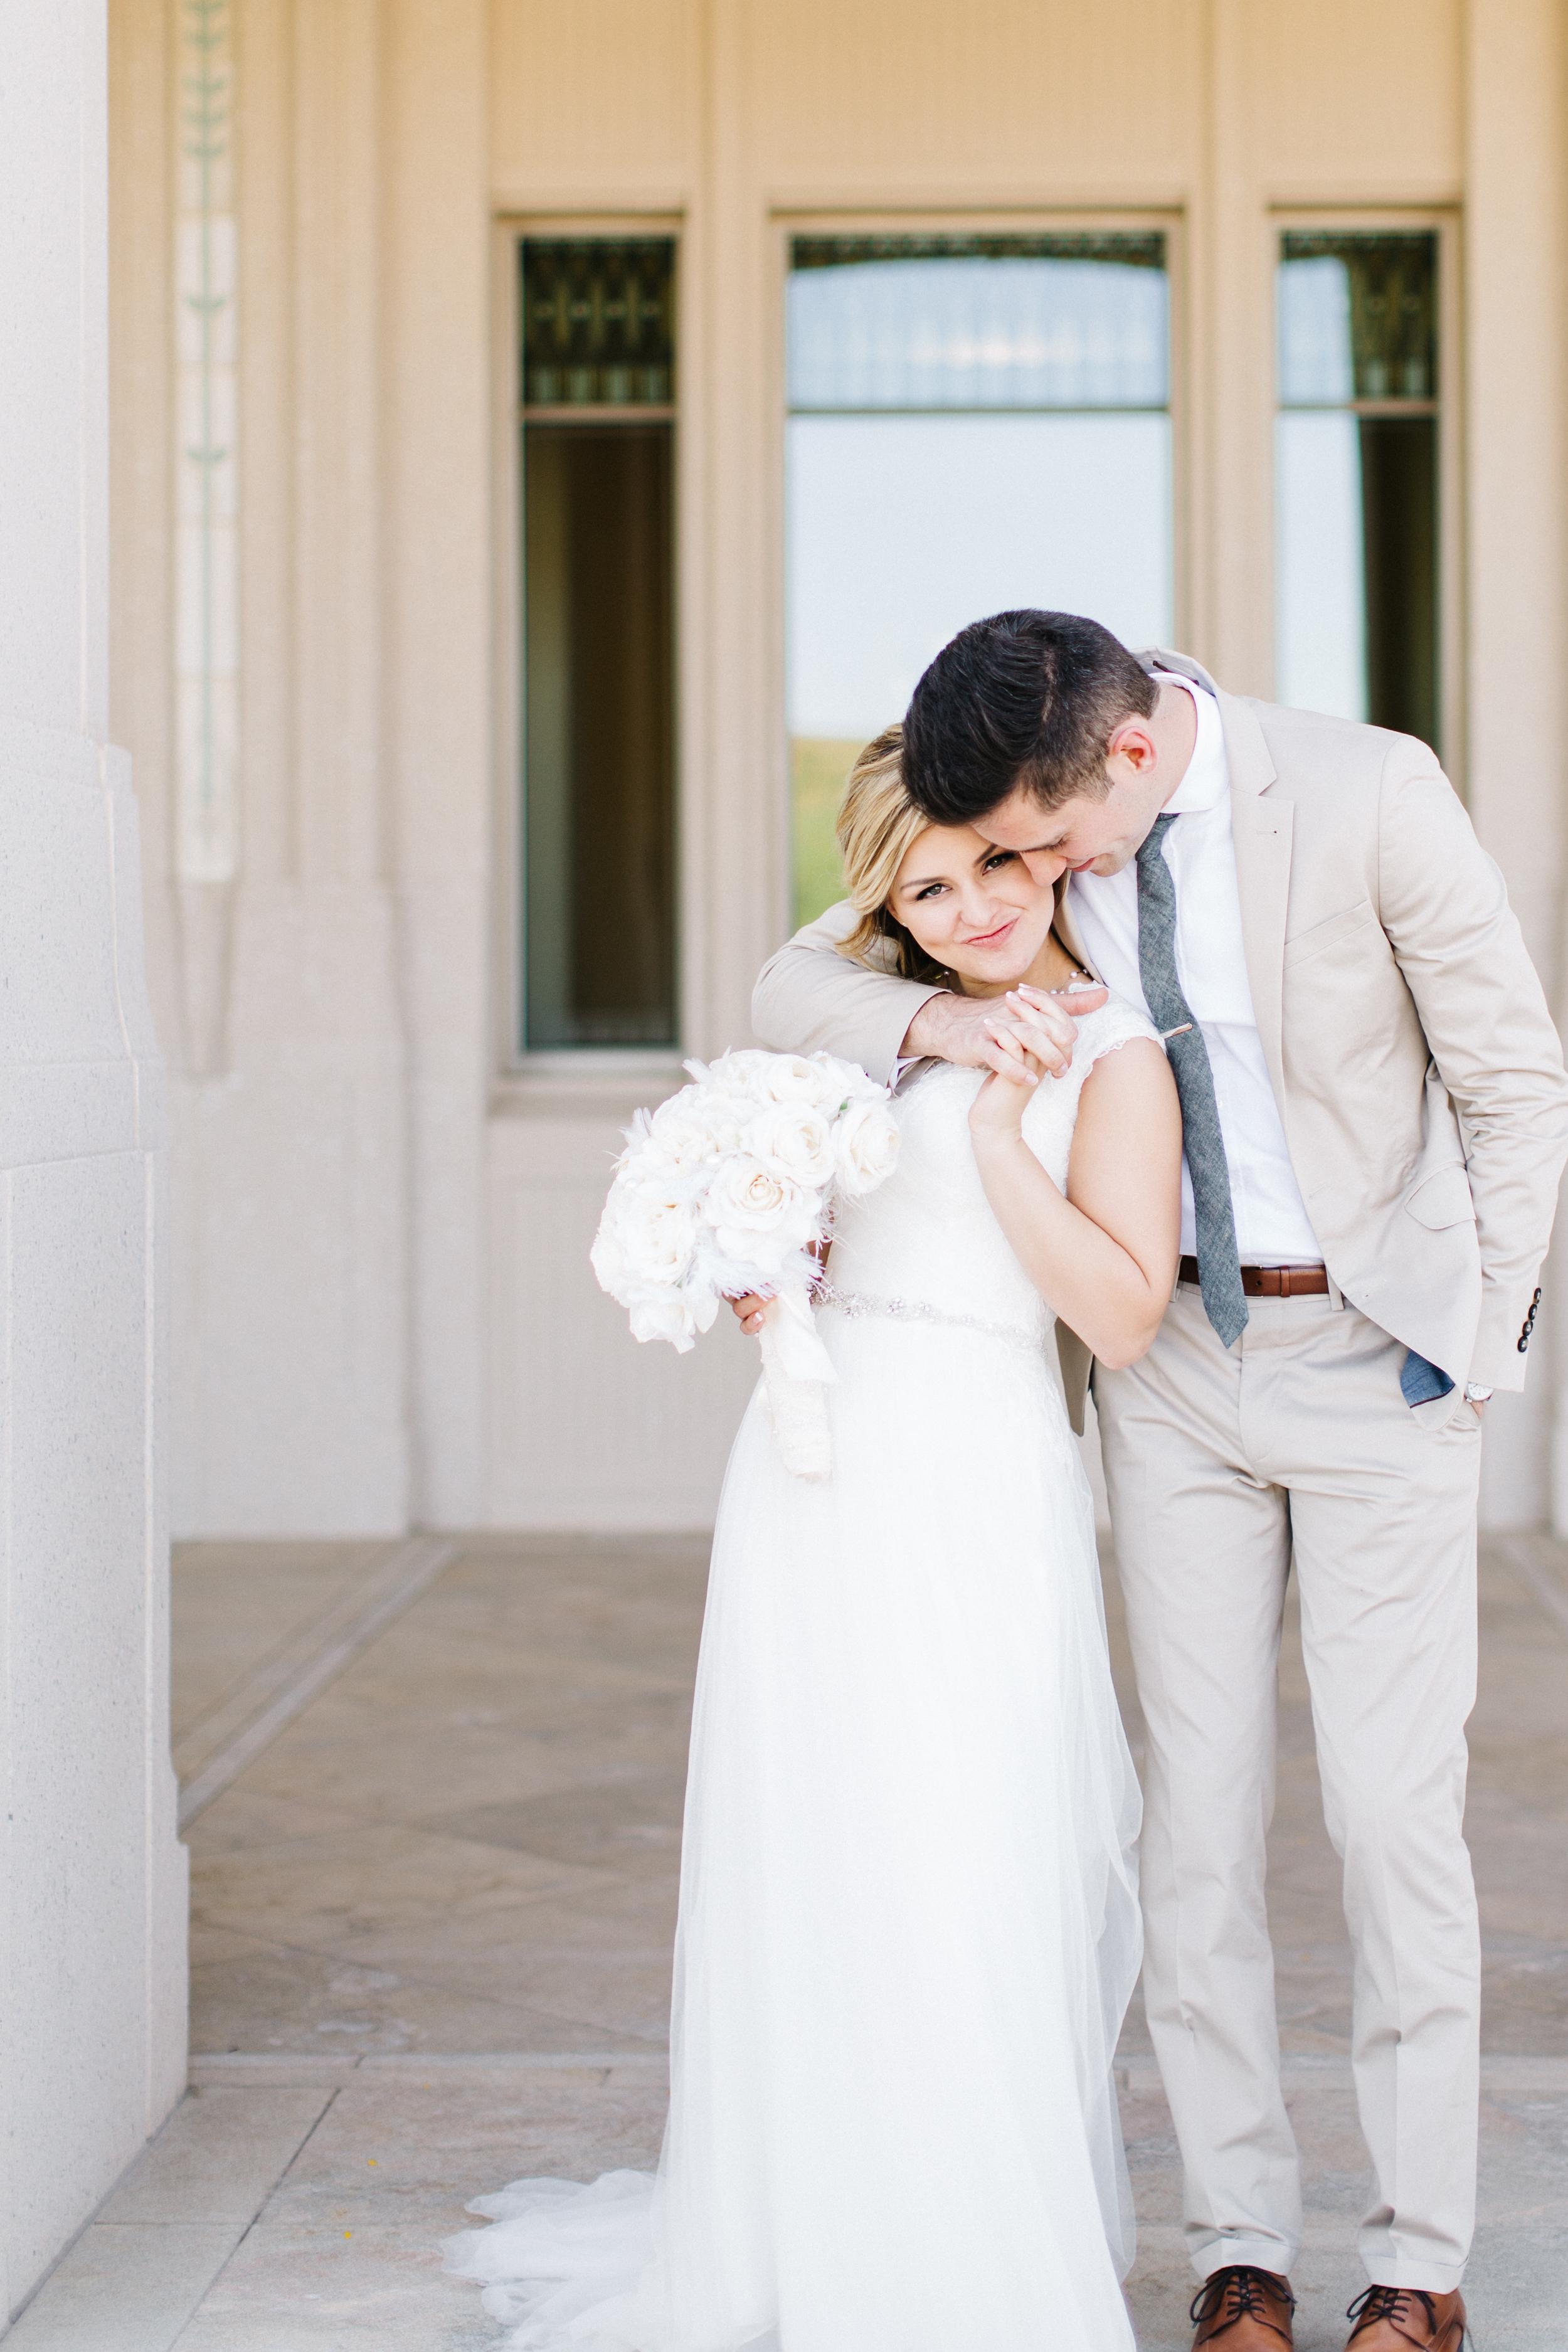 KennedyWyatt_WeddingDay-116.jpg